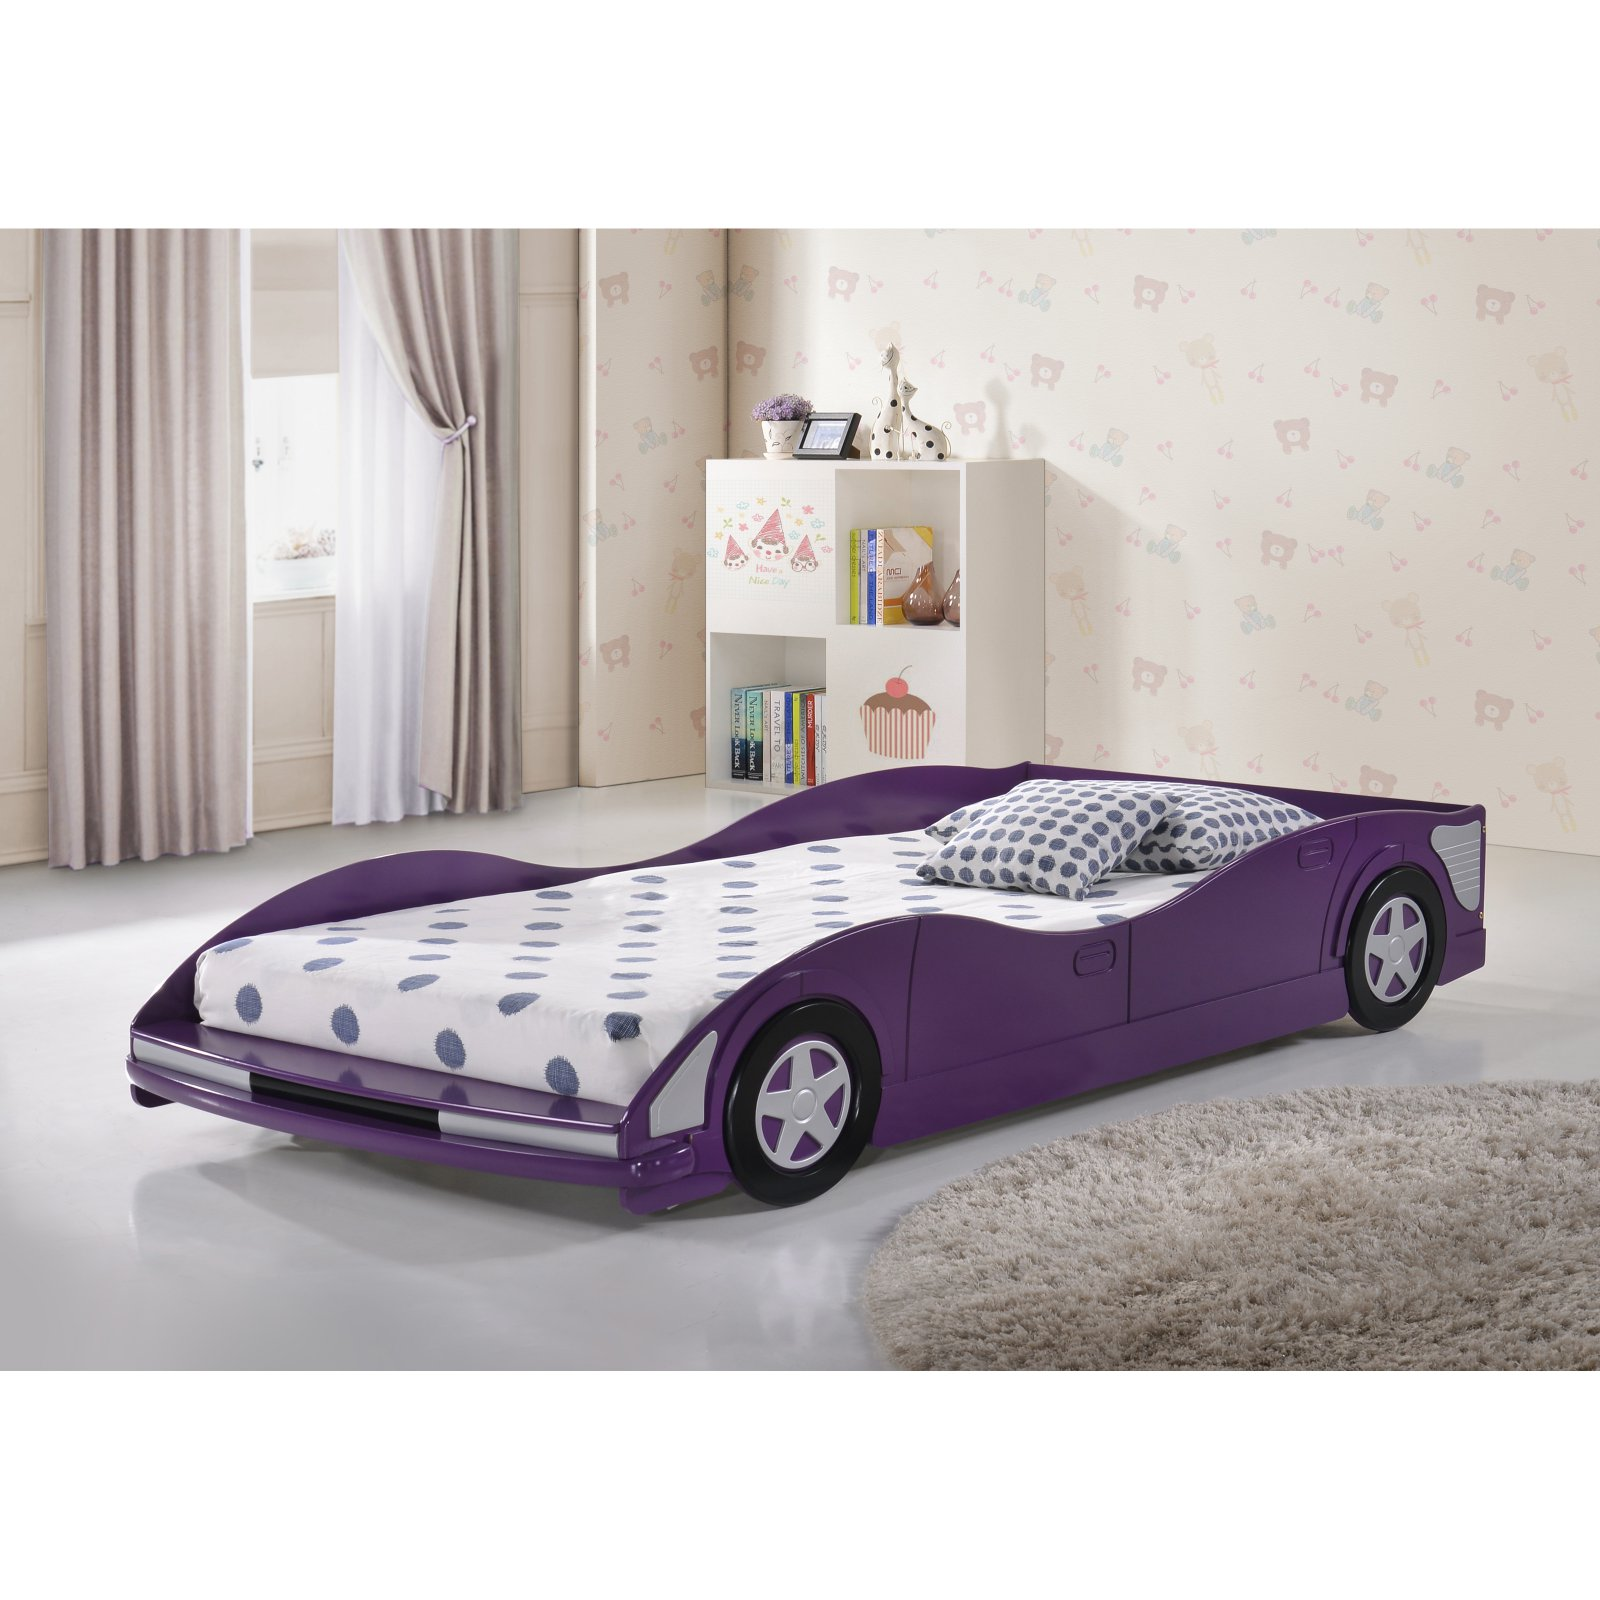 Donco Kids Race Car Bed